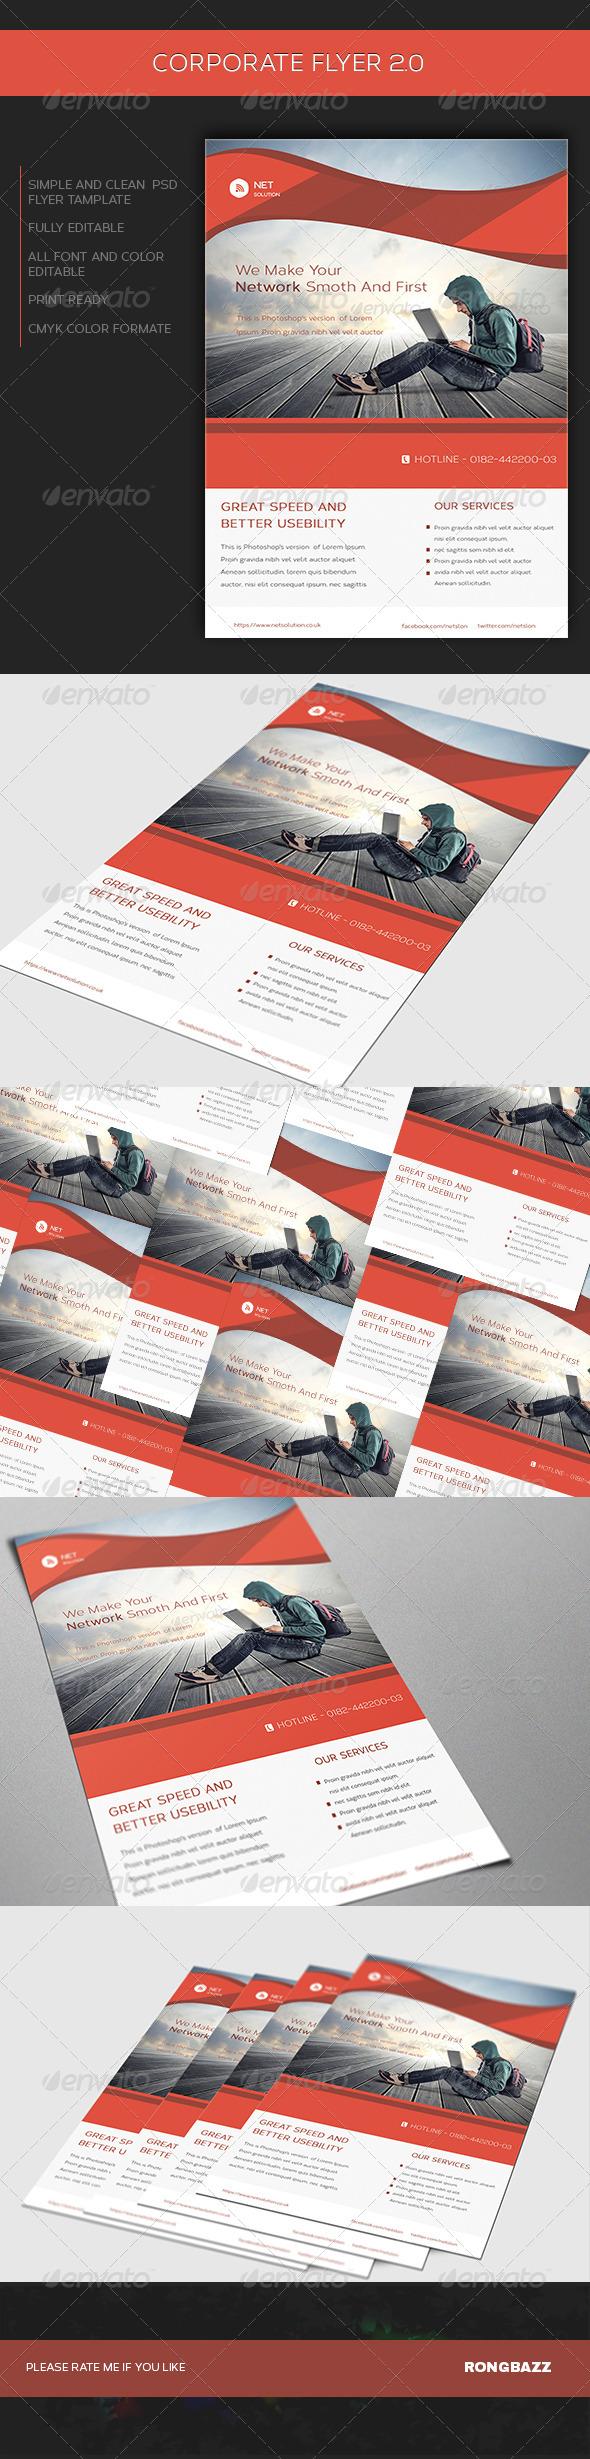 GraphicRiver Corporate Flyer 2.0 7194587